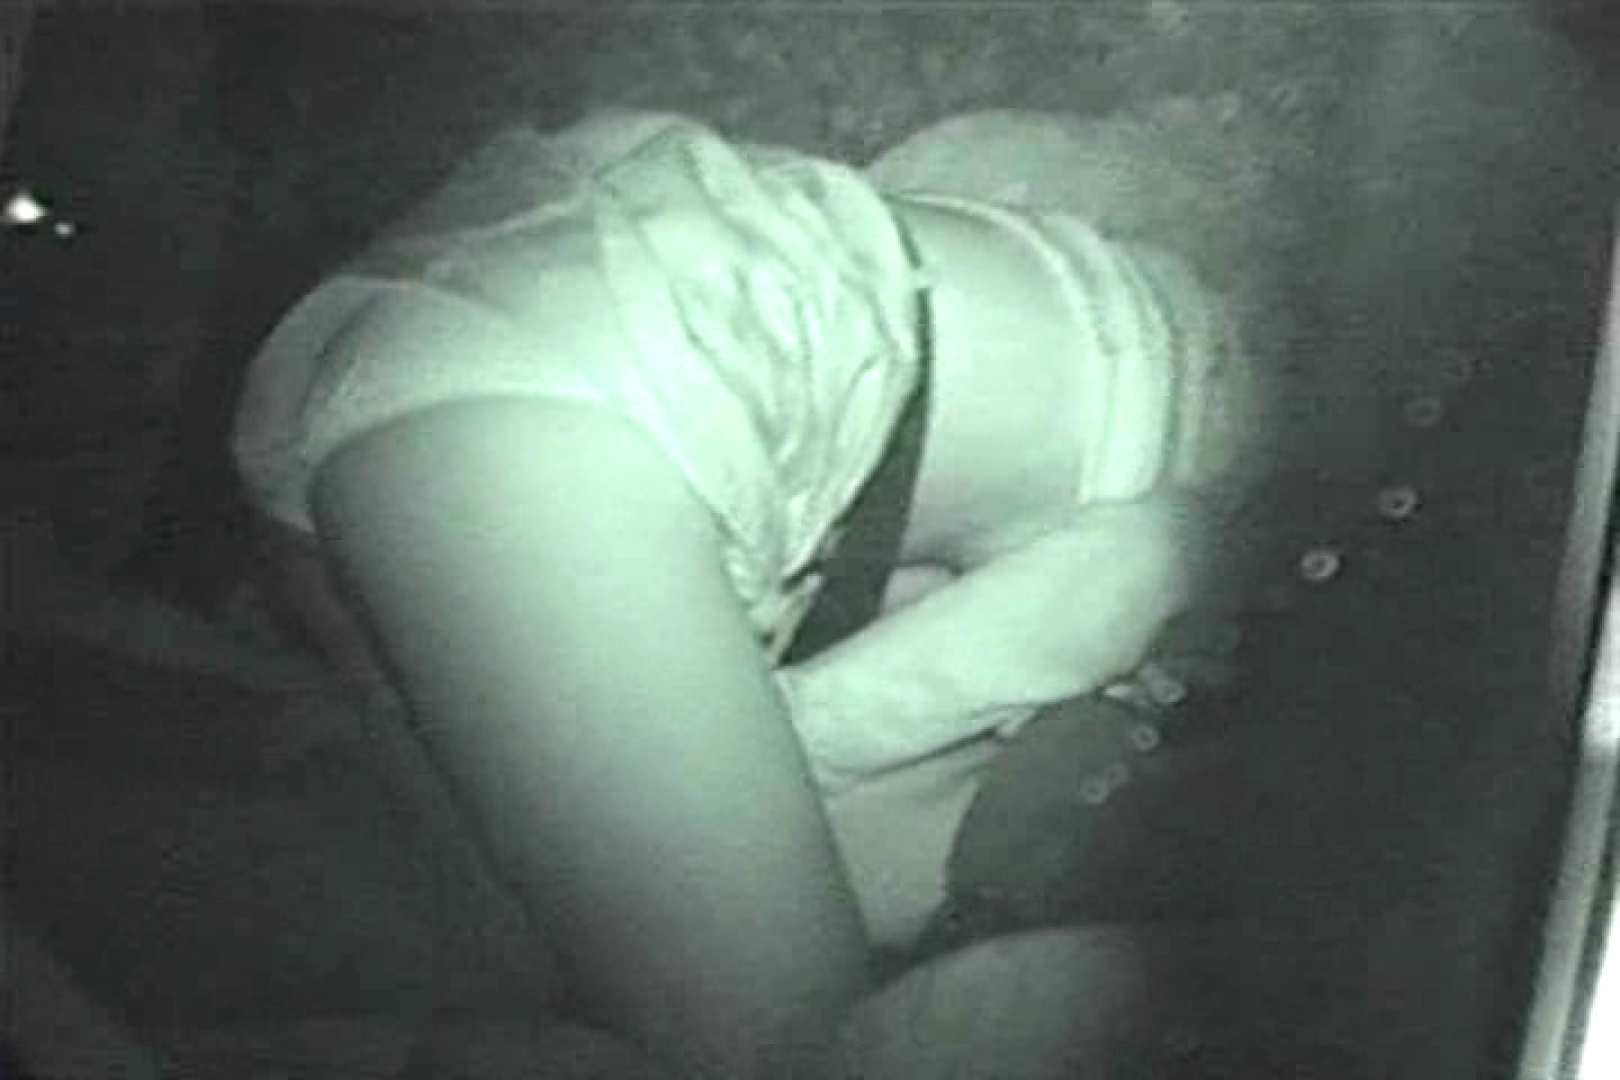 MASAさんの待ち伏せ撮り! 赤外線カーセックスVol.19 美しいOLの裸体   カーセックス  101pic 71